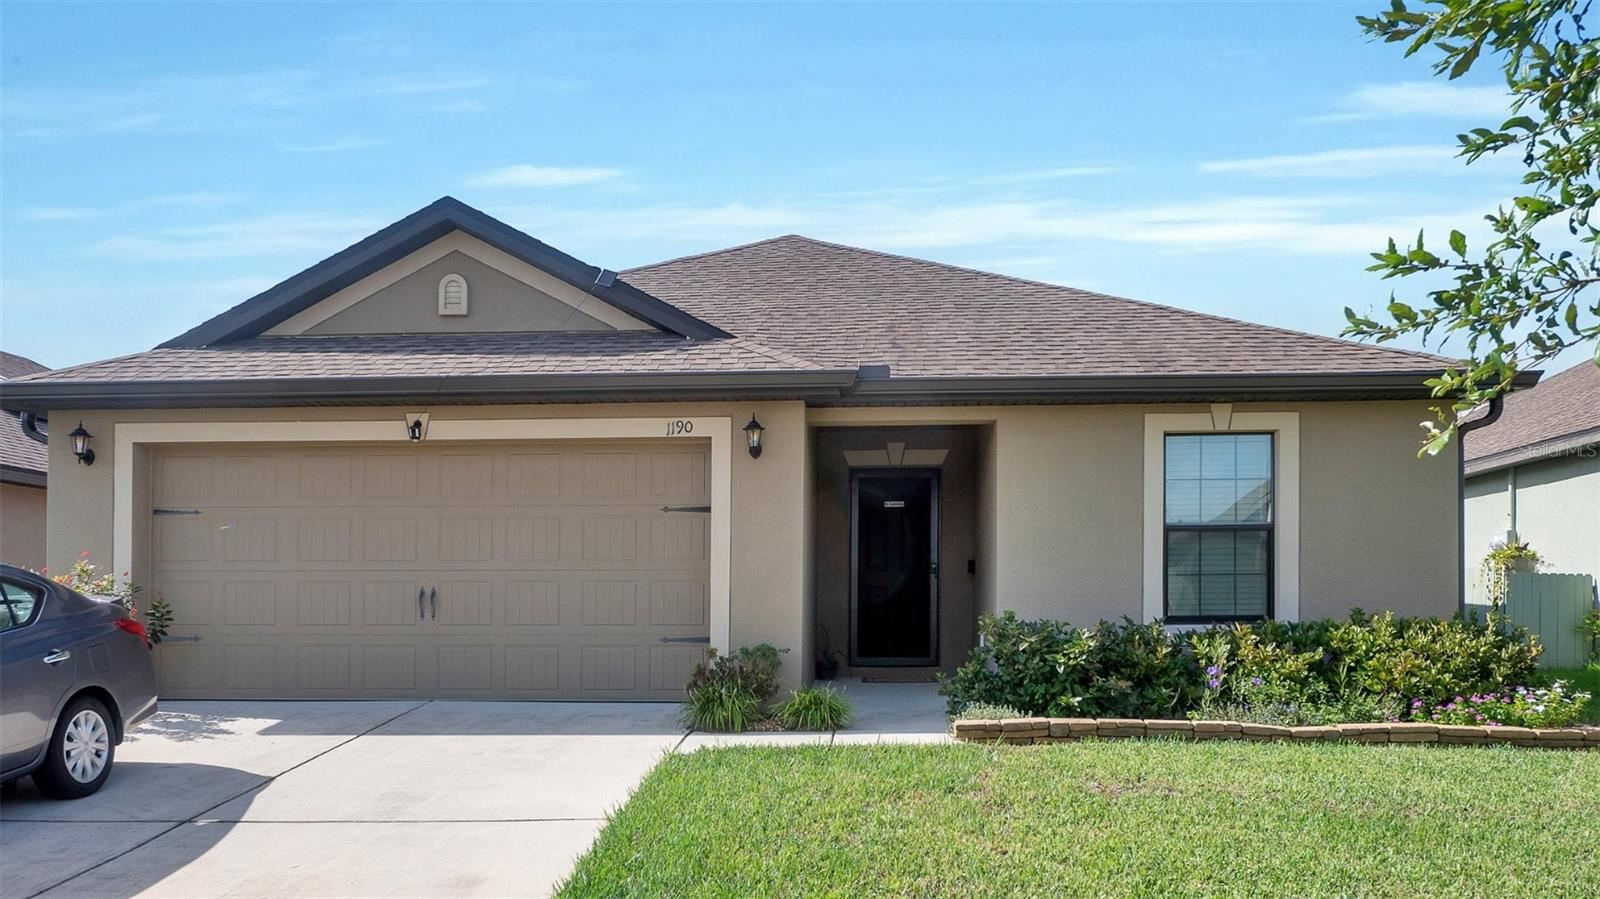 1190 WOODLARK DRIVE, Haines City, FL 33844 - #: G5046027